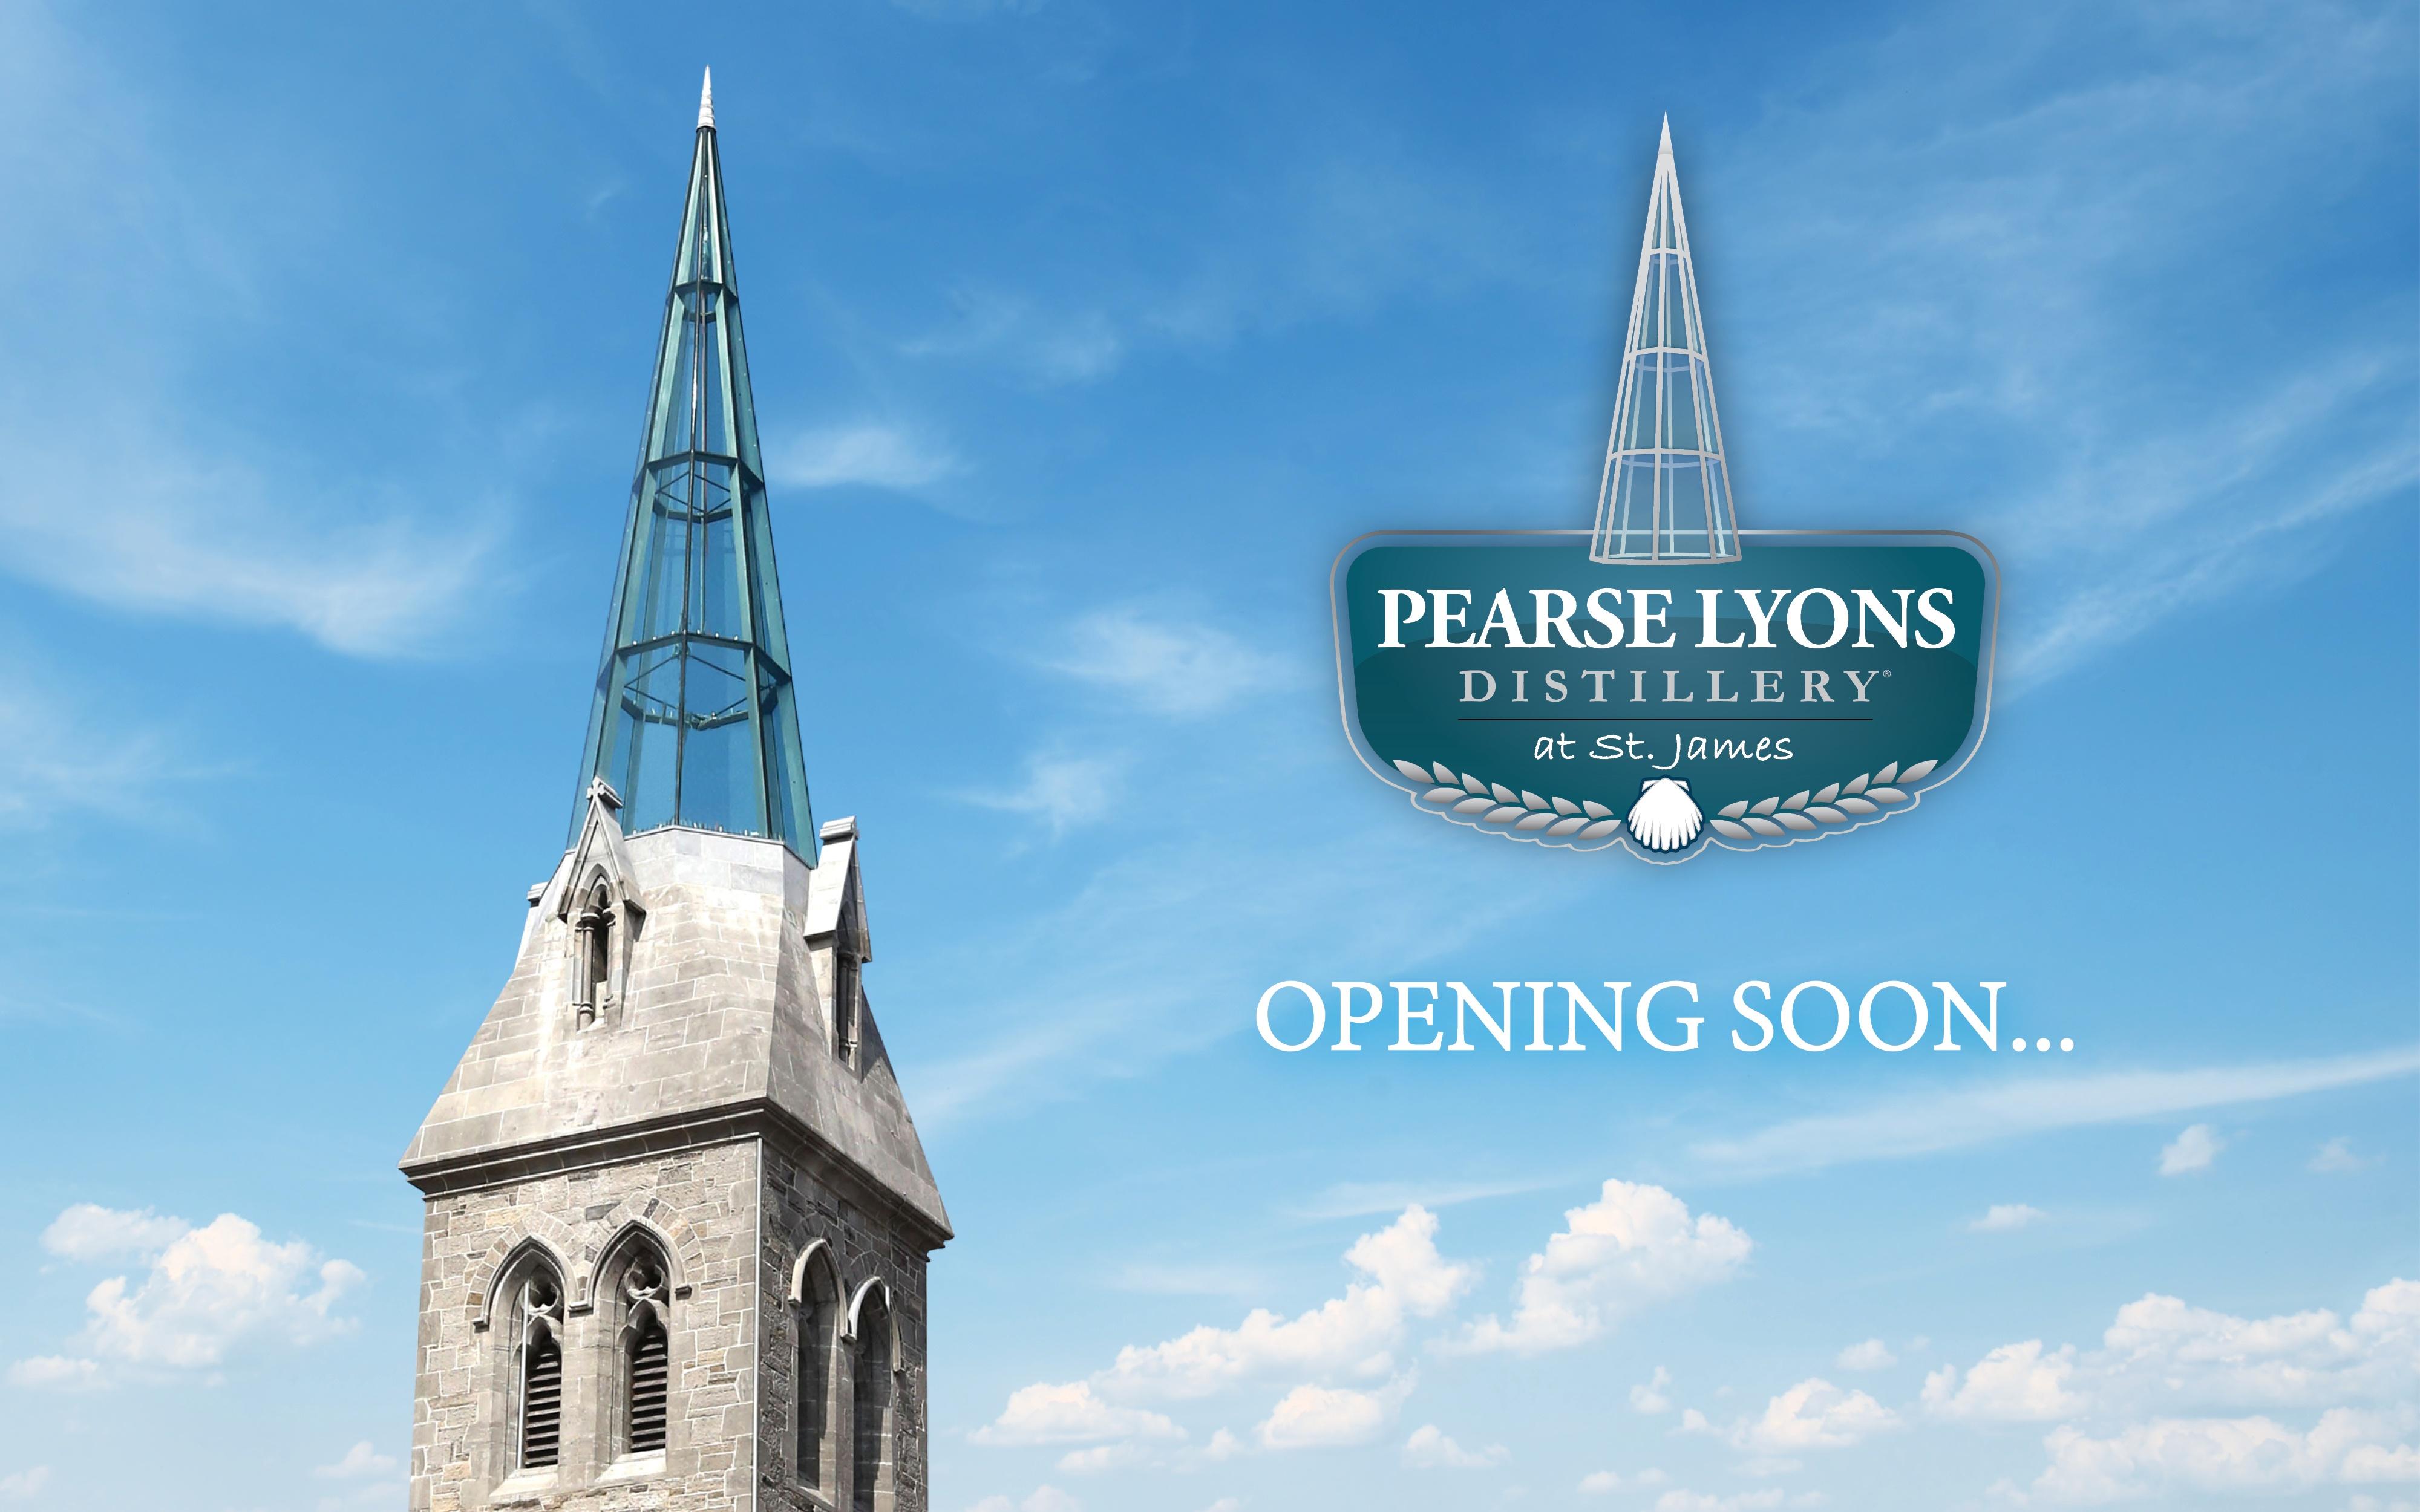 Pearse Lyons distillery page opening soon (002).jpg